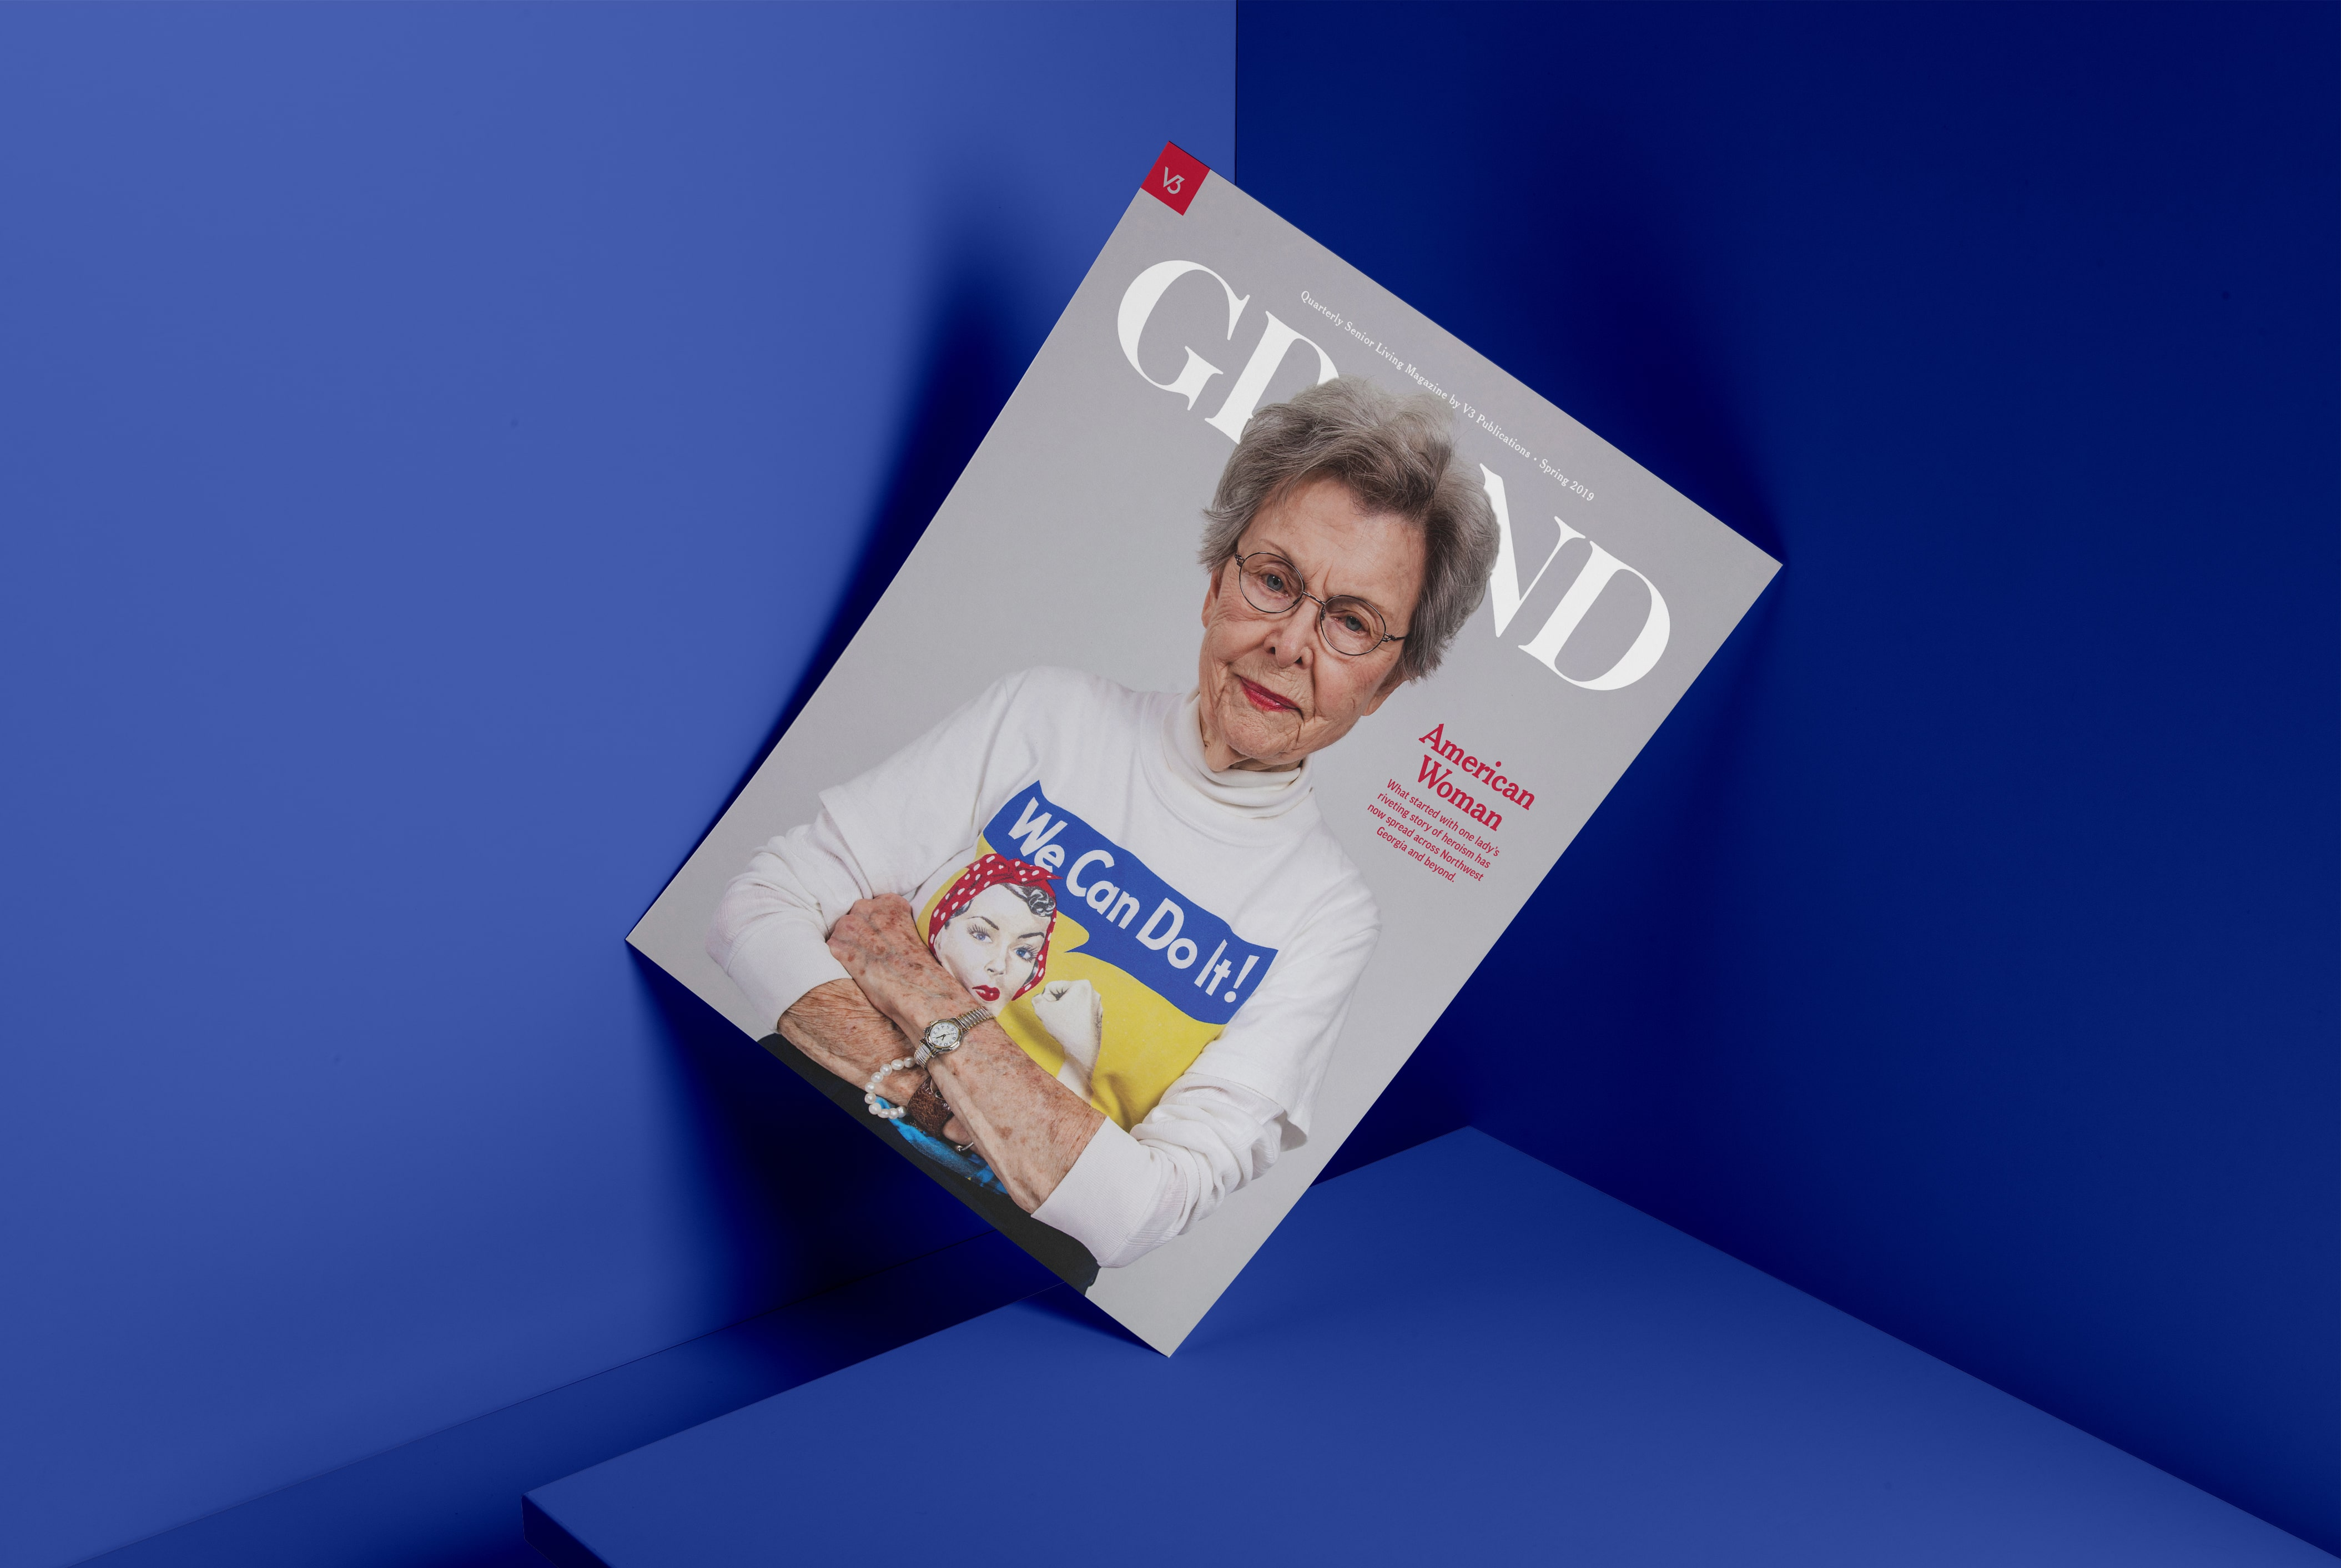 v3 grand magazine cover design